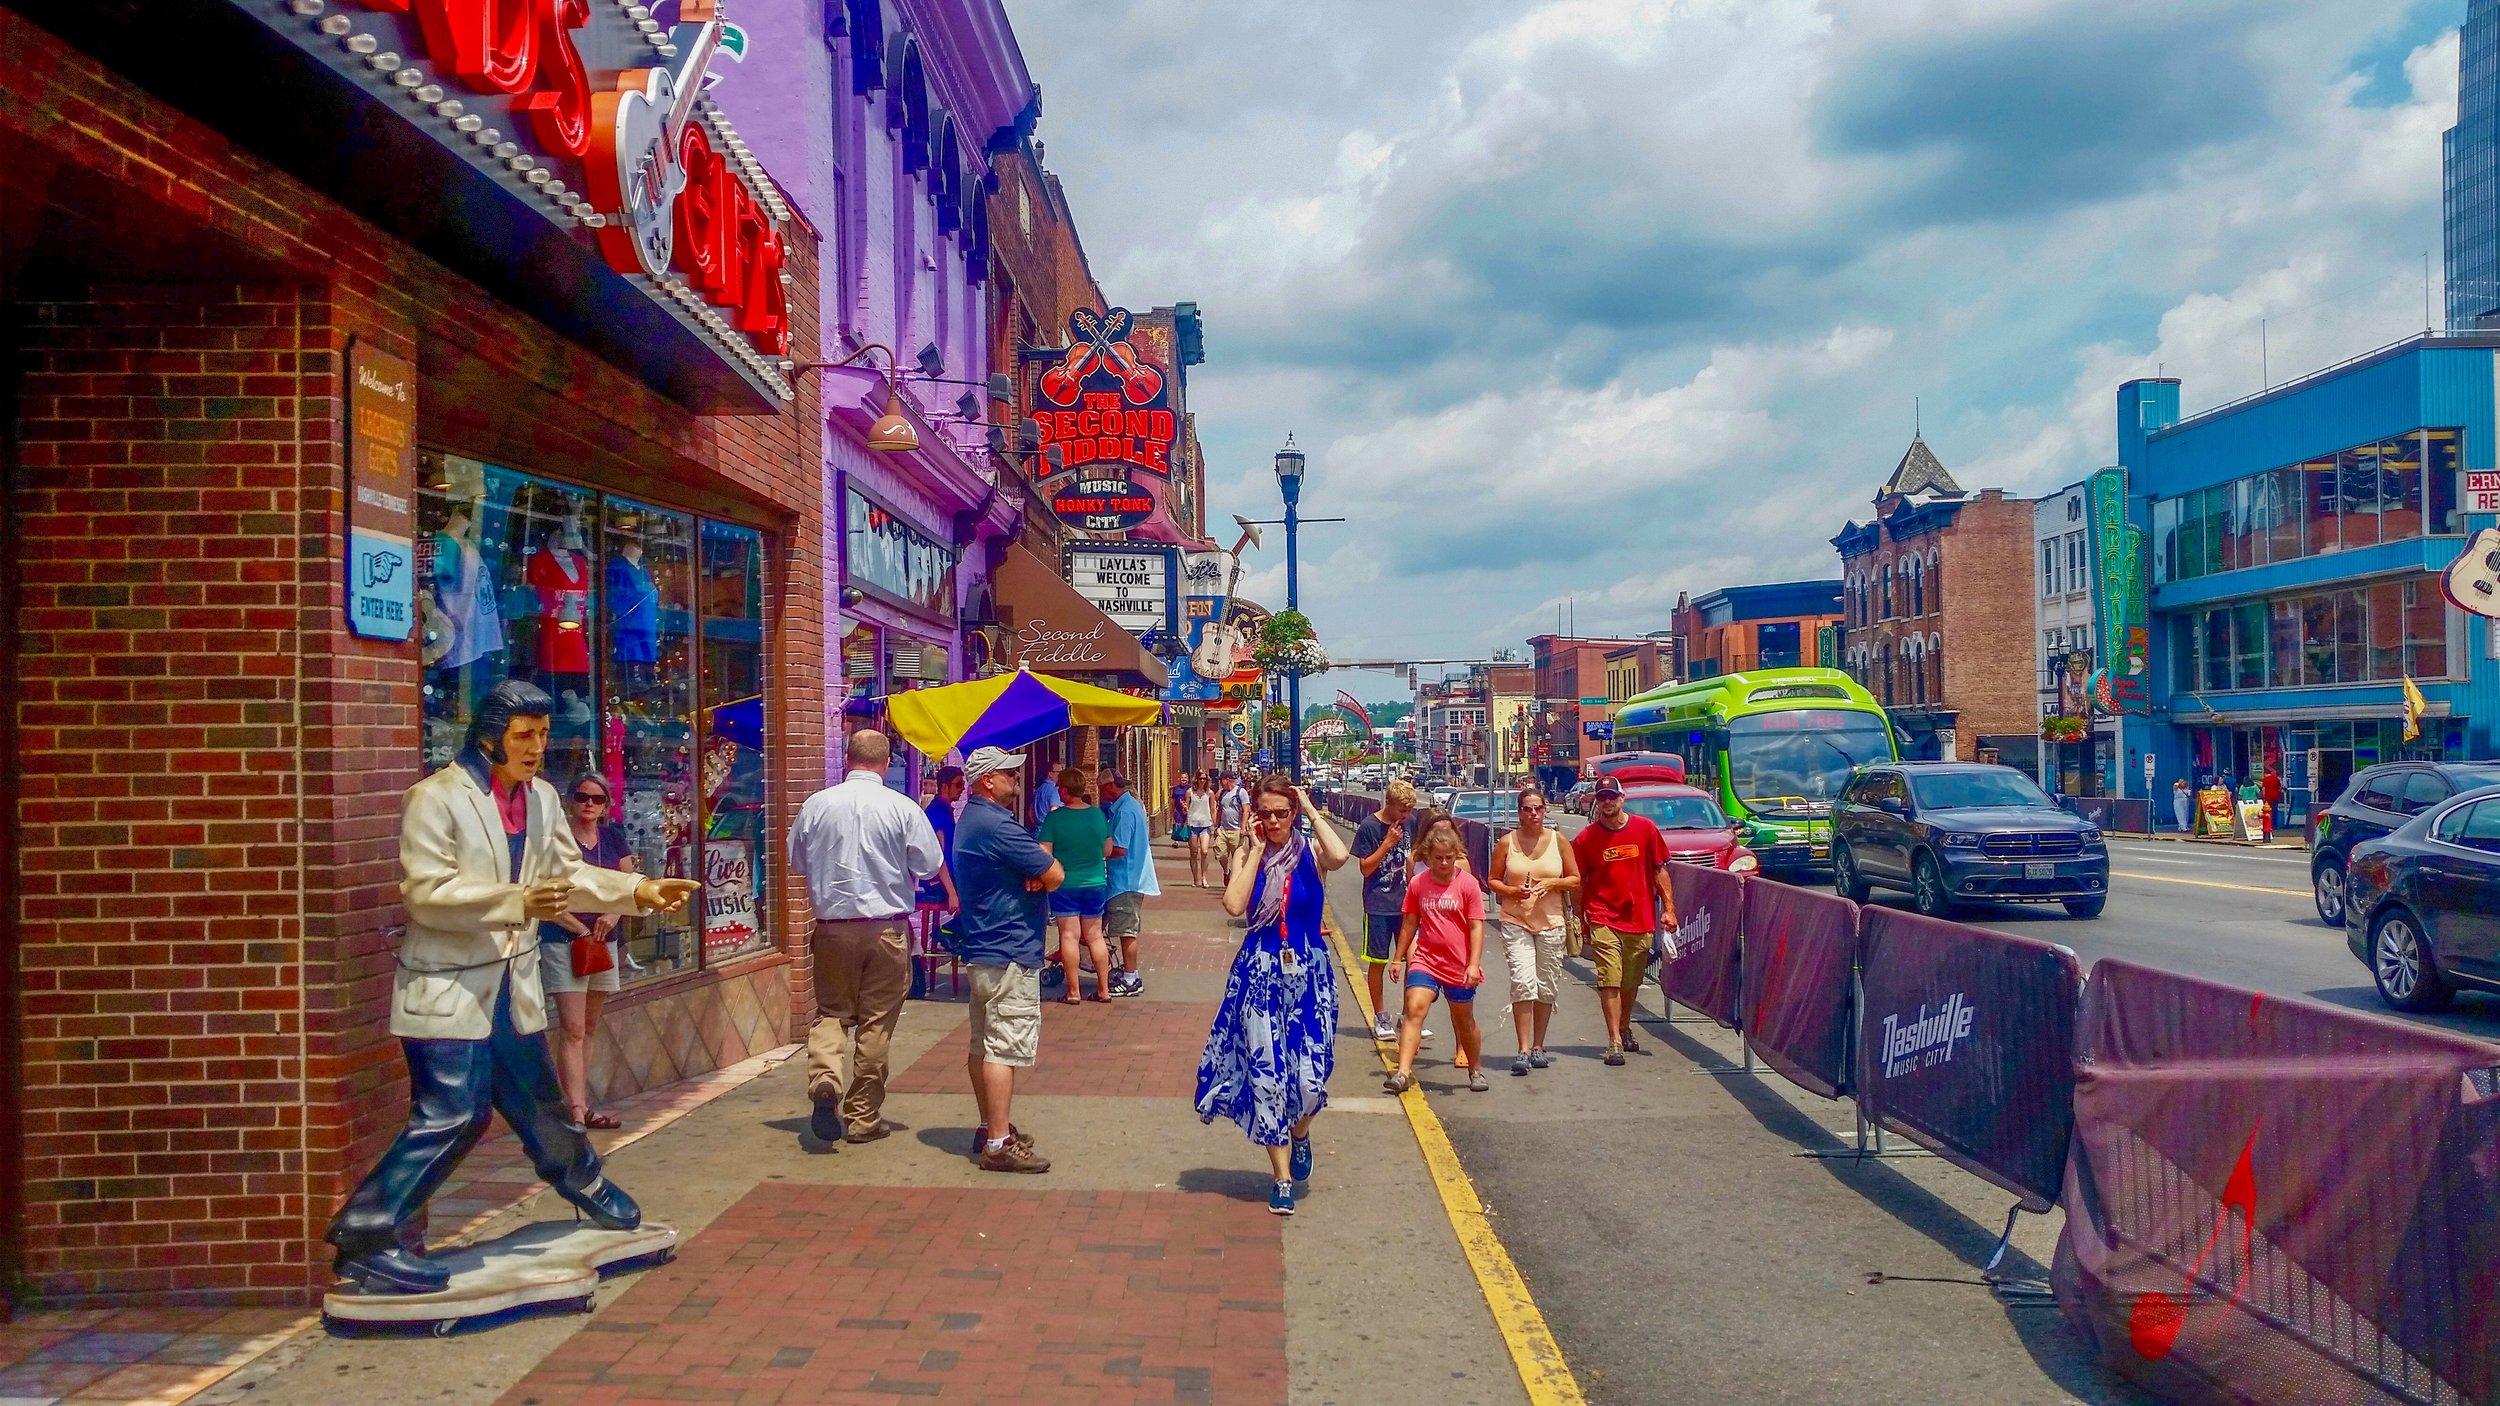 Broadway, Nashville's main drag